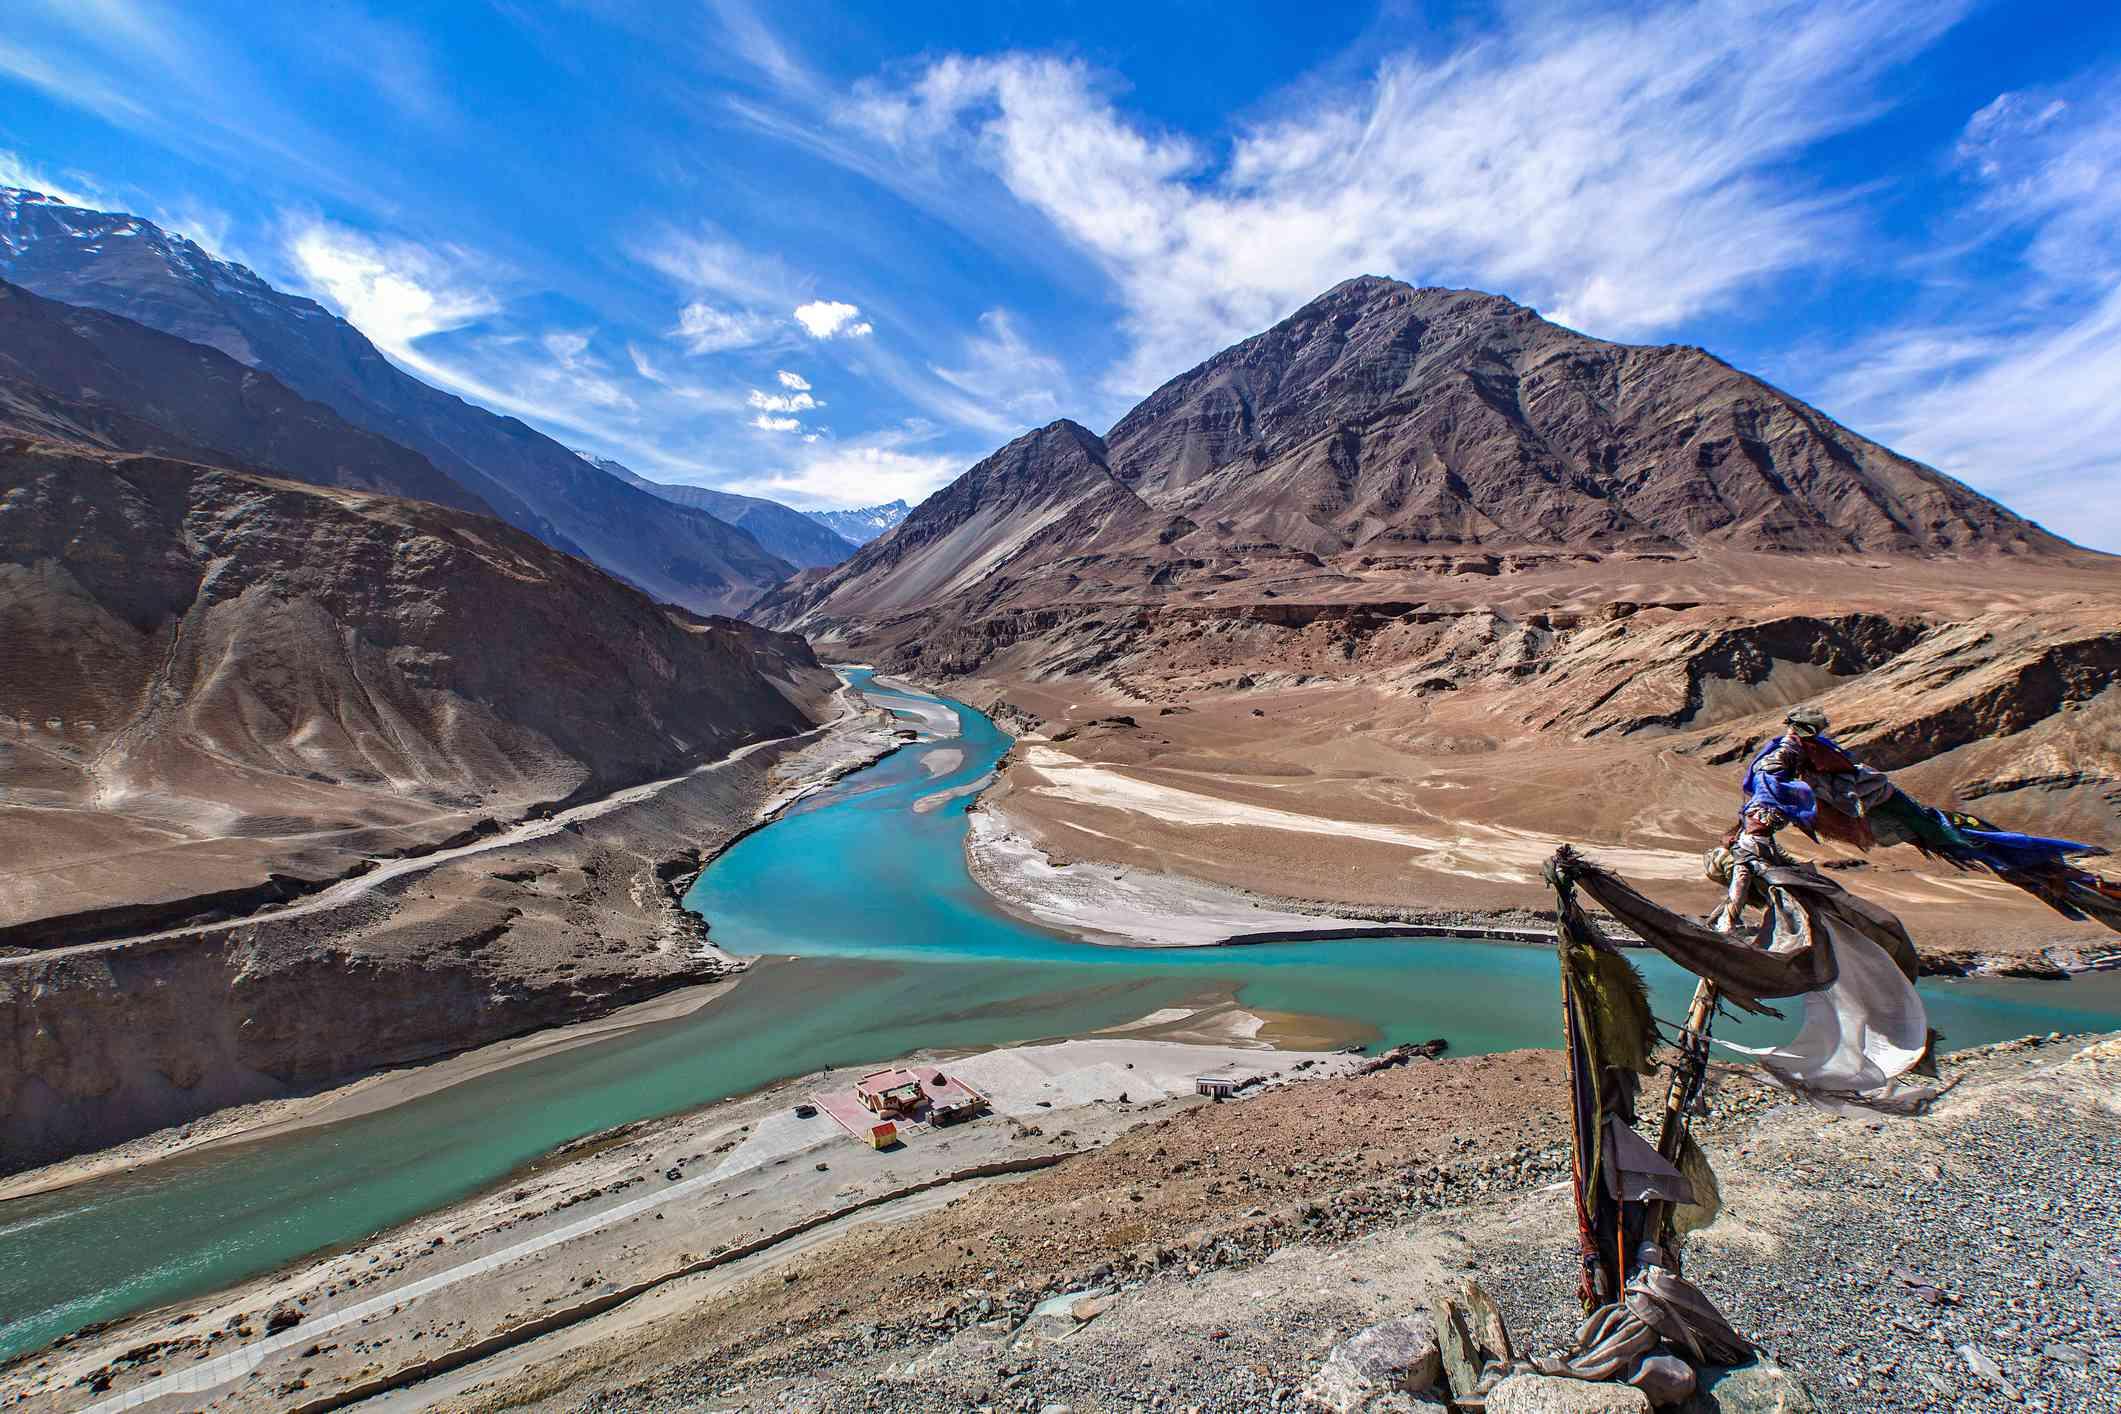 Indus Zanskar confluence